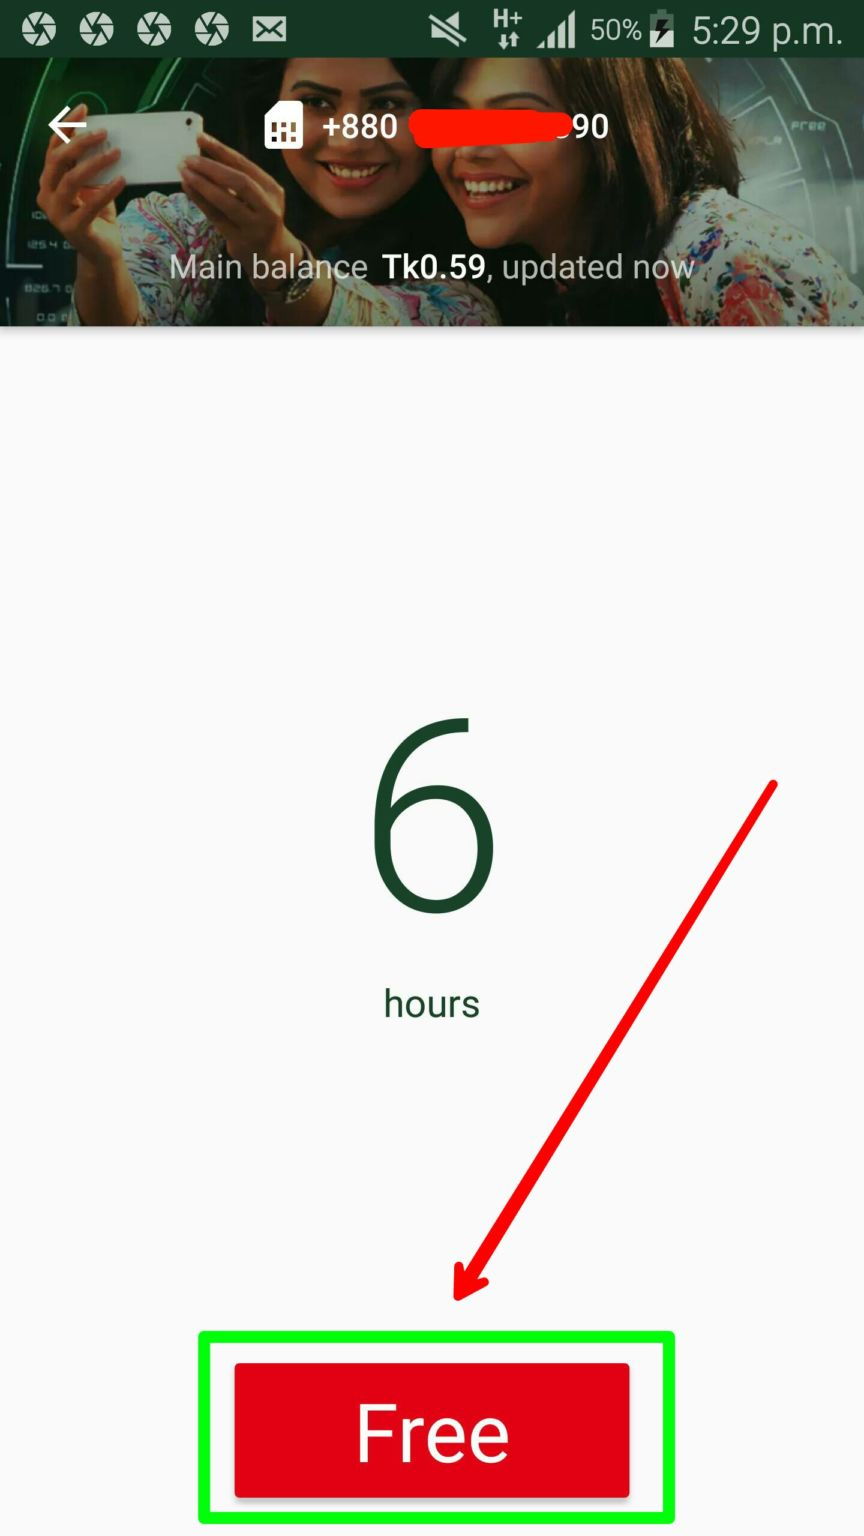 [Hot Post] যেকোন রবি সিমে 250 MB একদম ফ্রি.. সবাই পাবেন.. [Free][iBuddy]